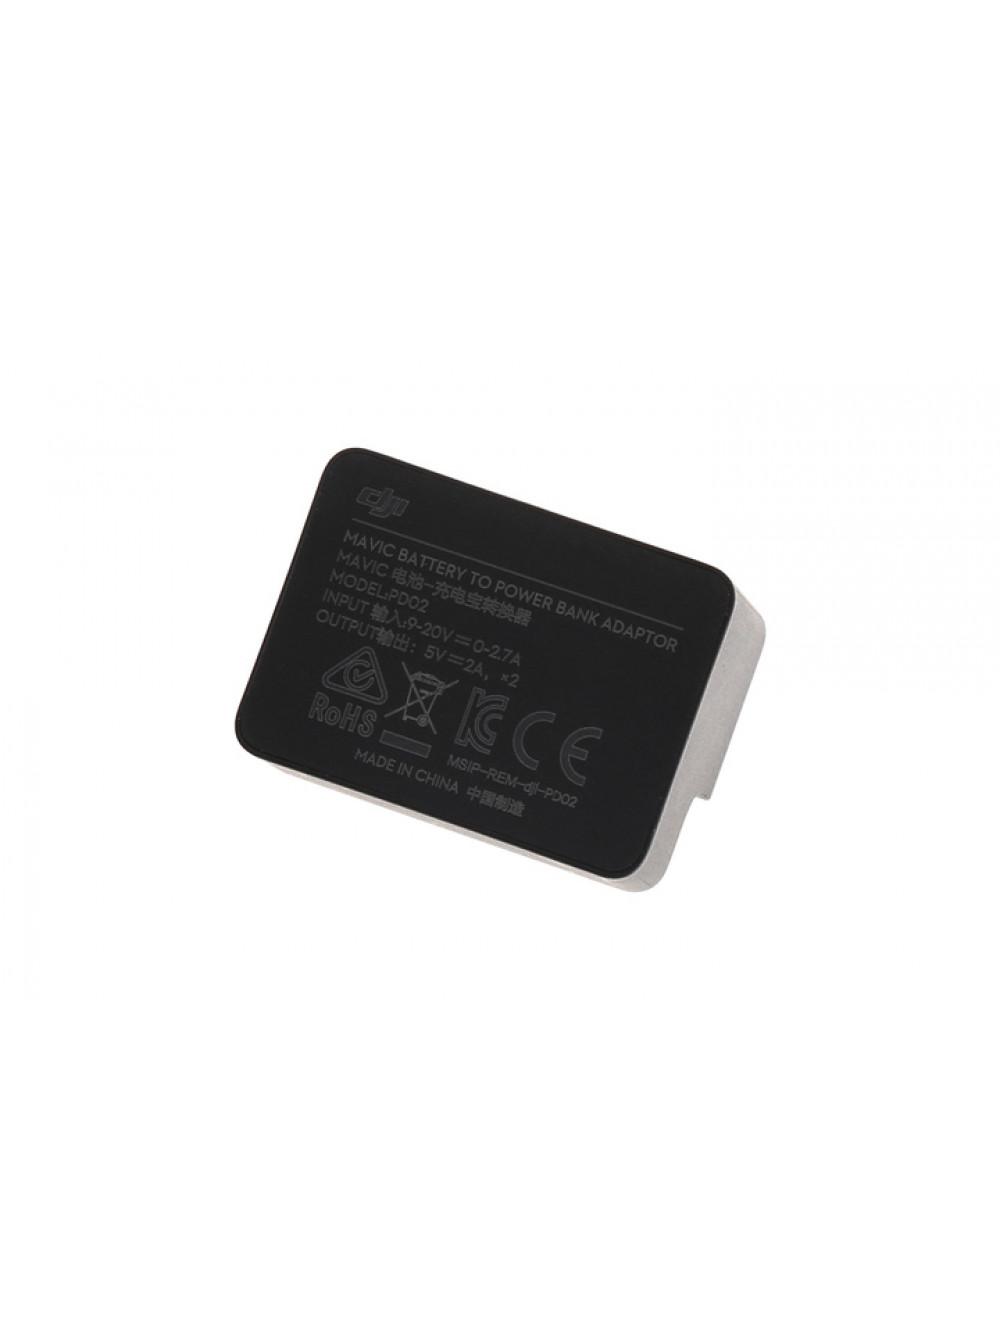 Power Bank Адаптер для зарядки устройств от аккумулятора DJi Mavic